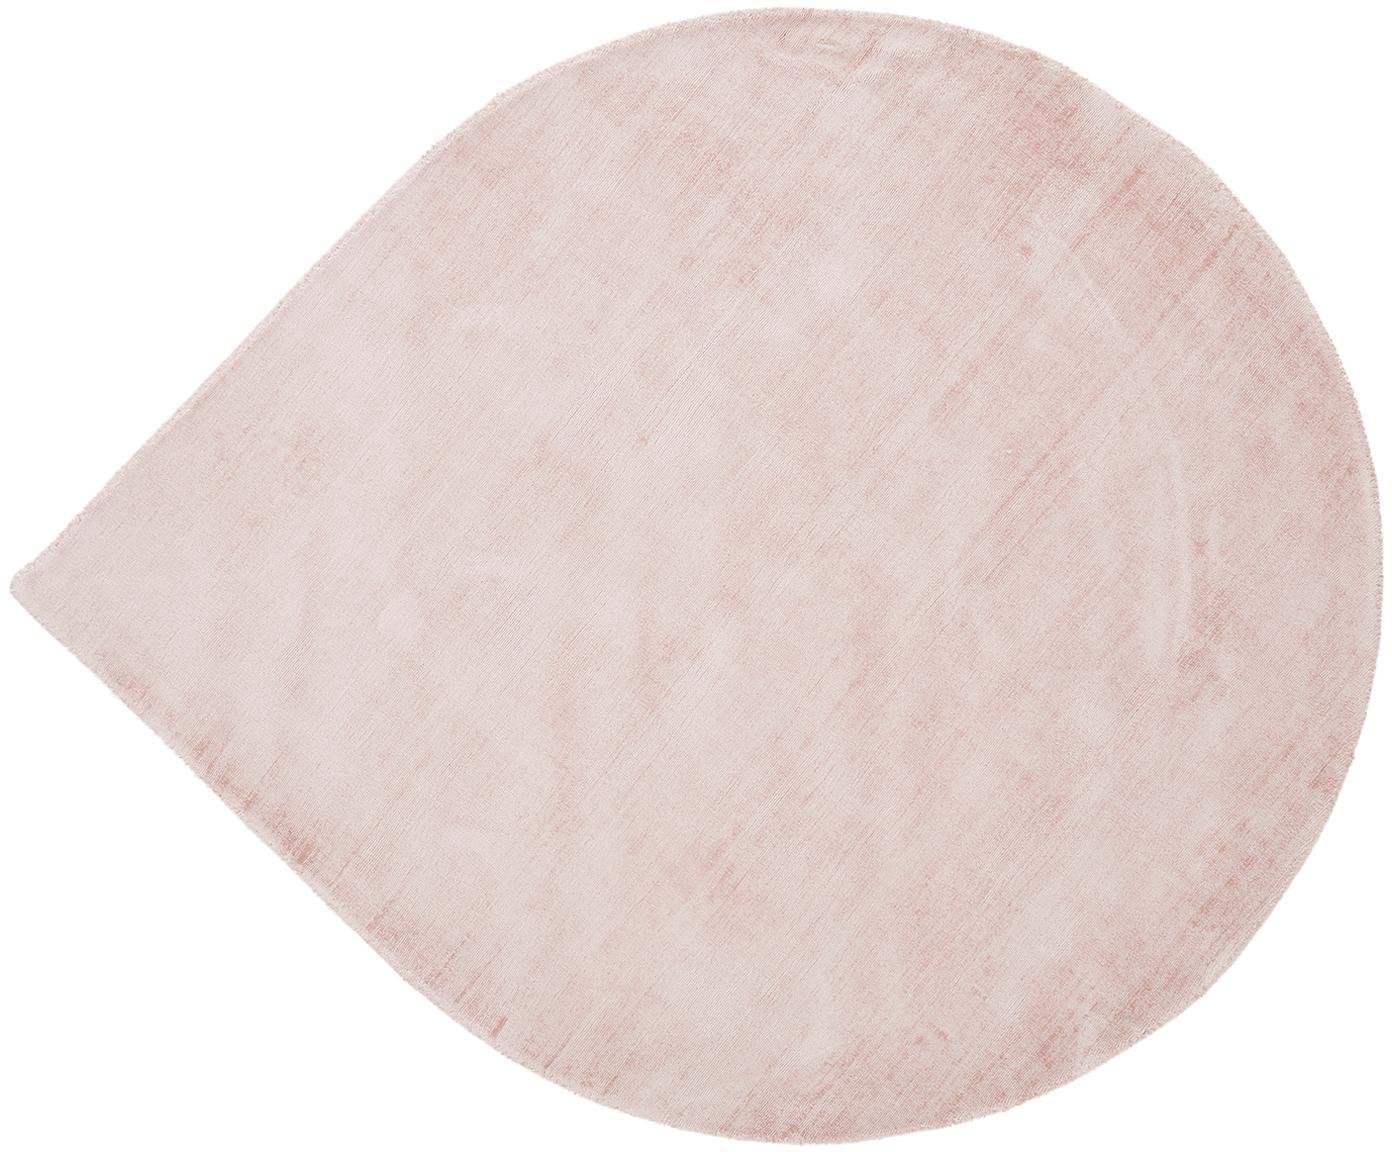 Handgewebter Viskoseteppich Jane Drop in Tropfenform, Flor: 100% Viskose, Rosa, Ø 150 cm (Grösse M)